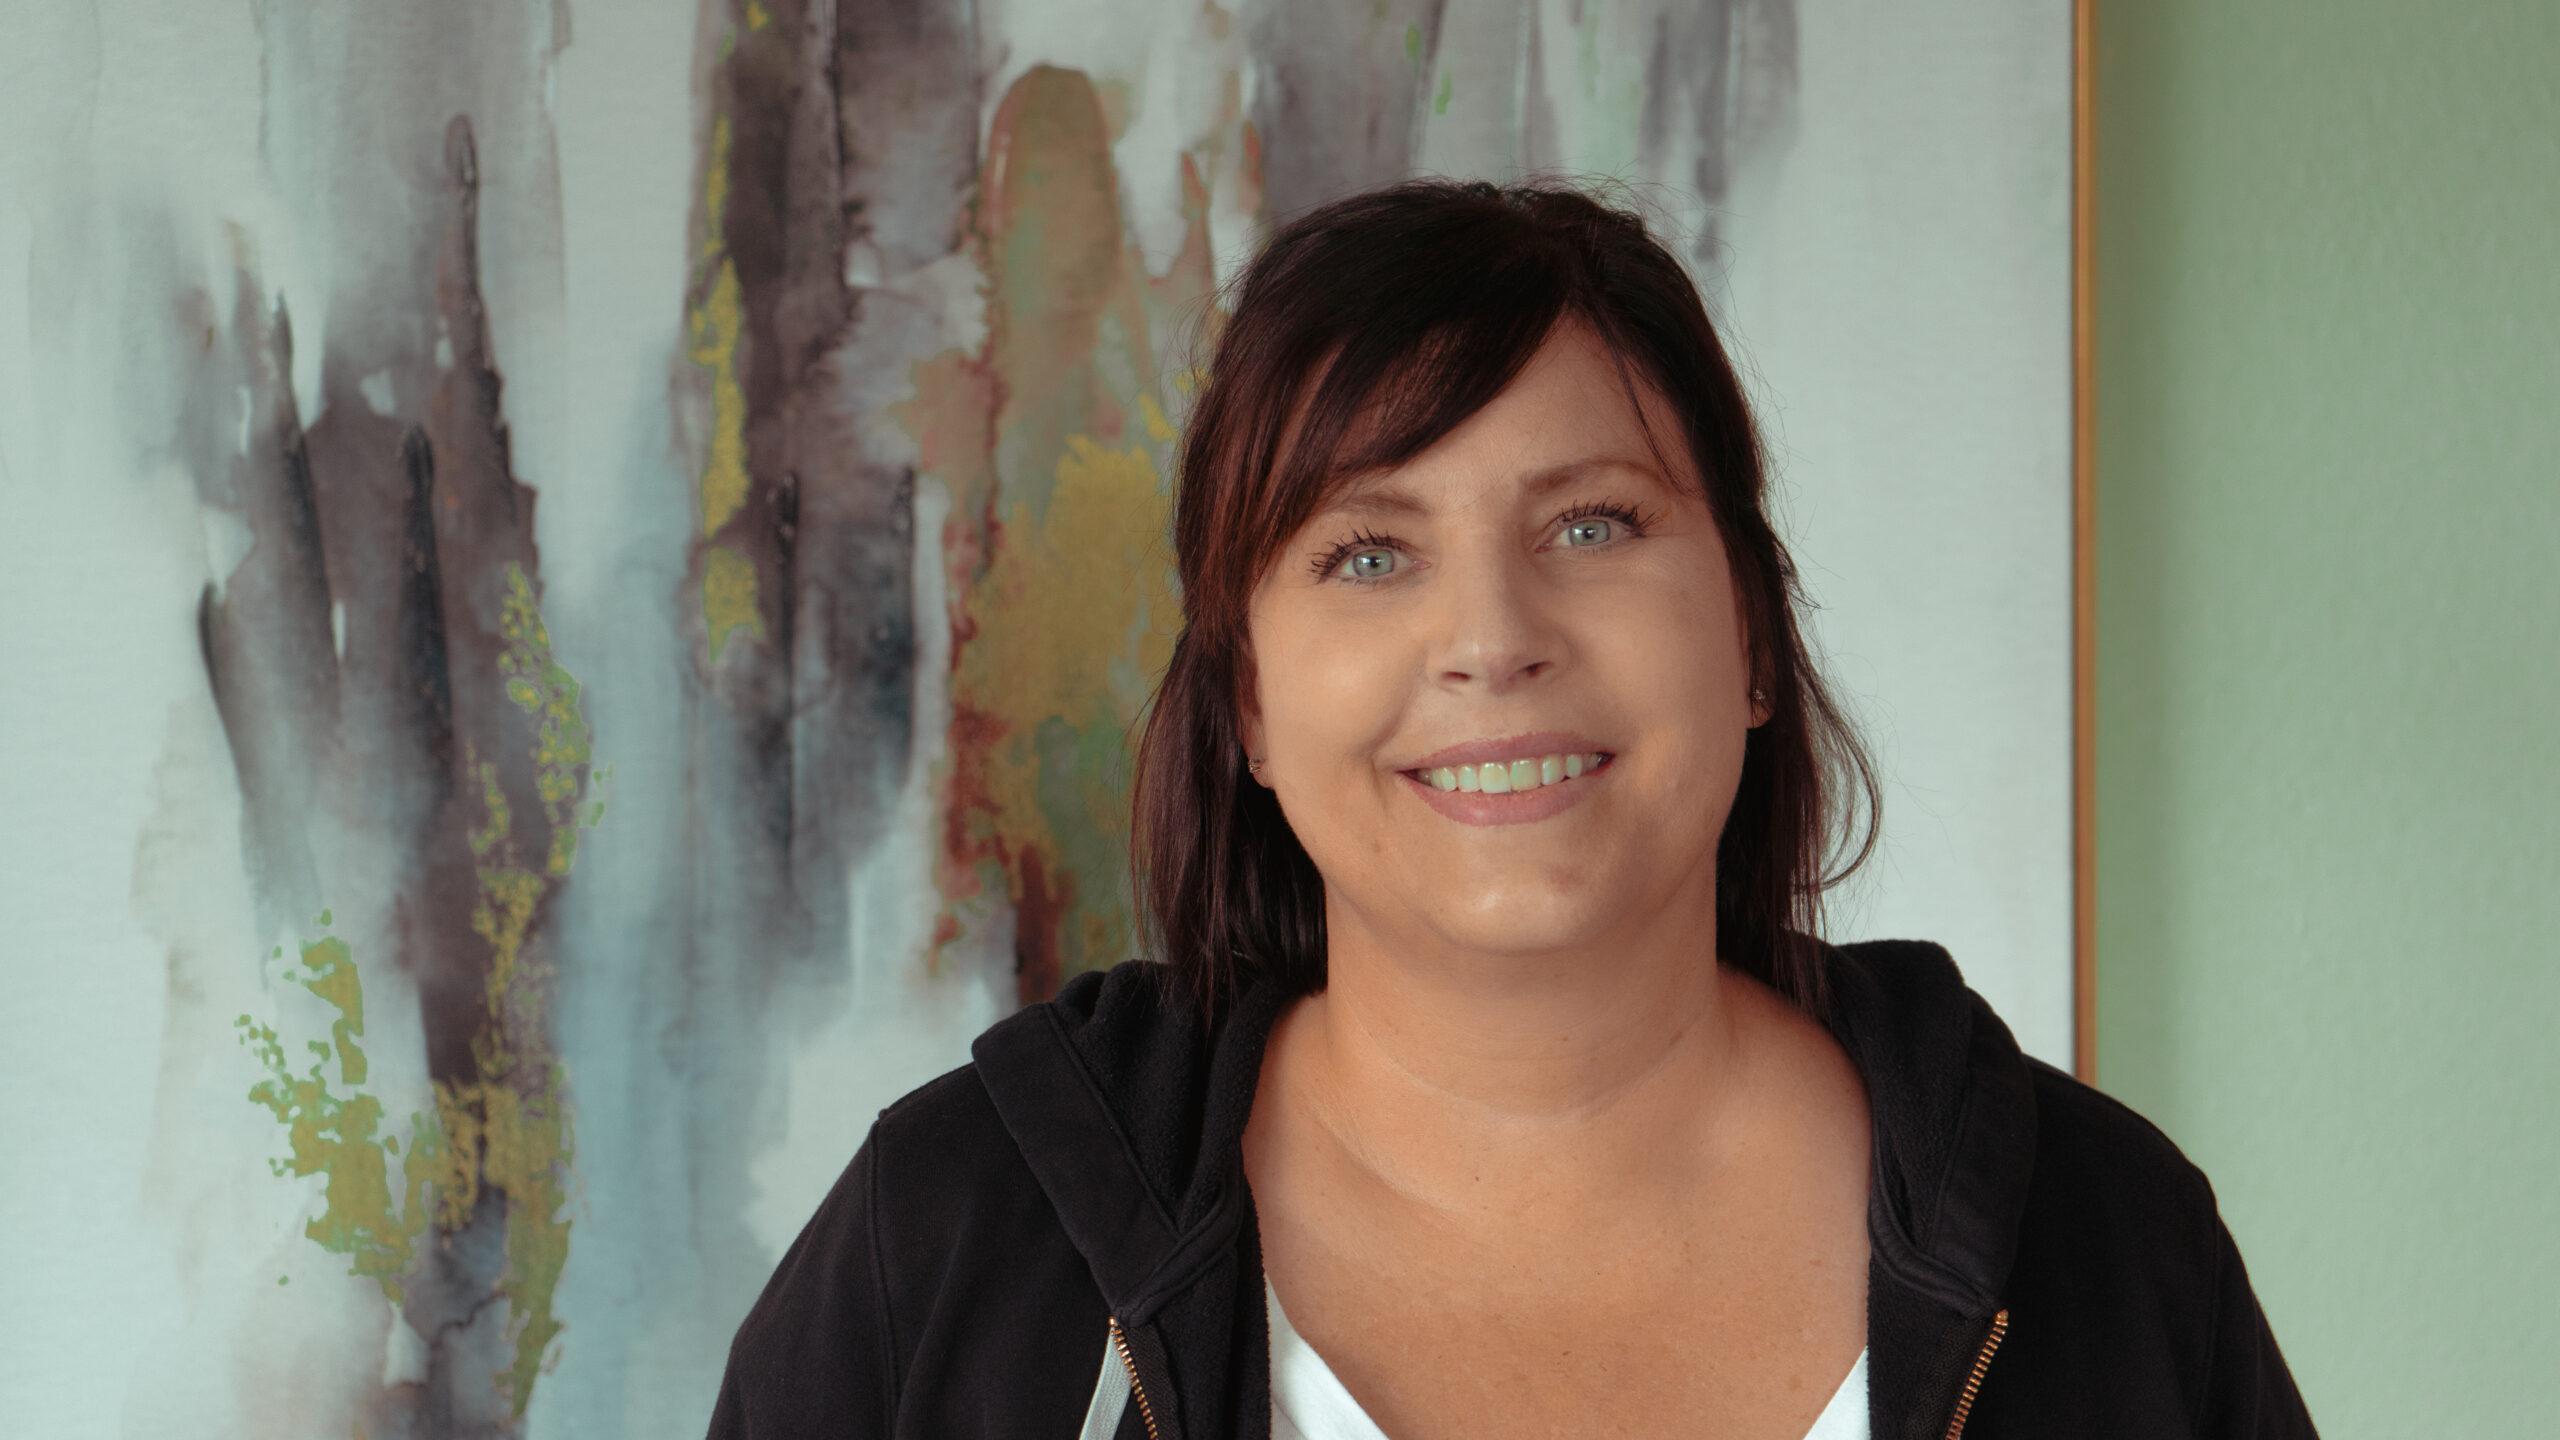 Heidi Molloy